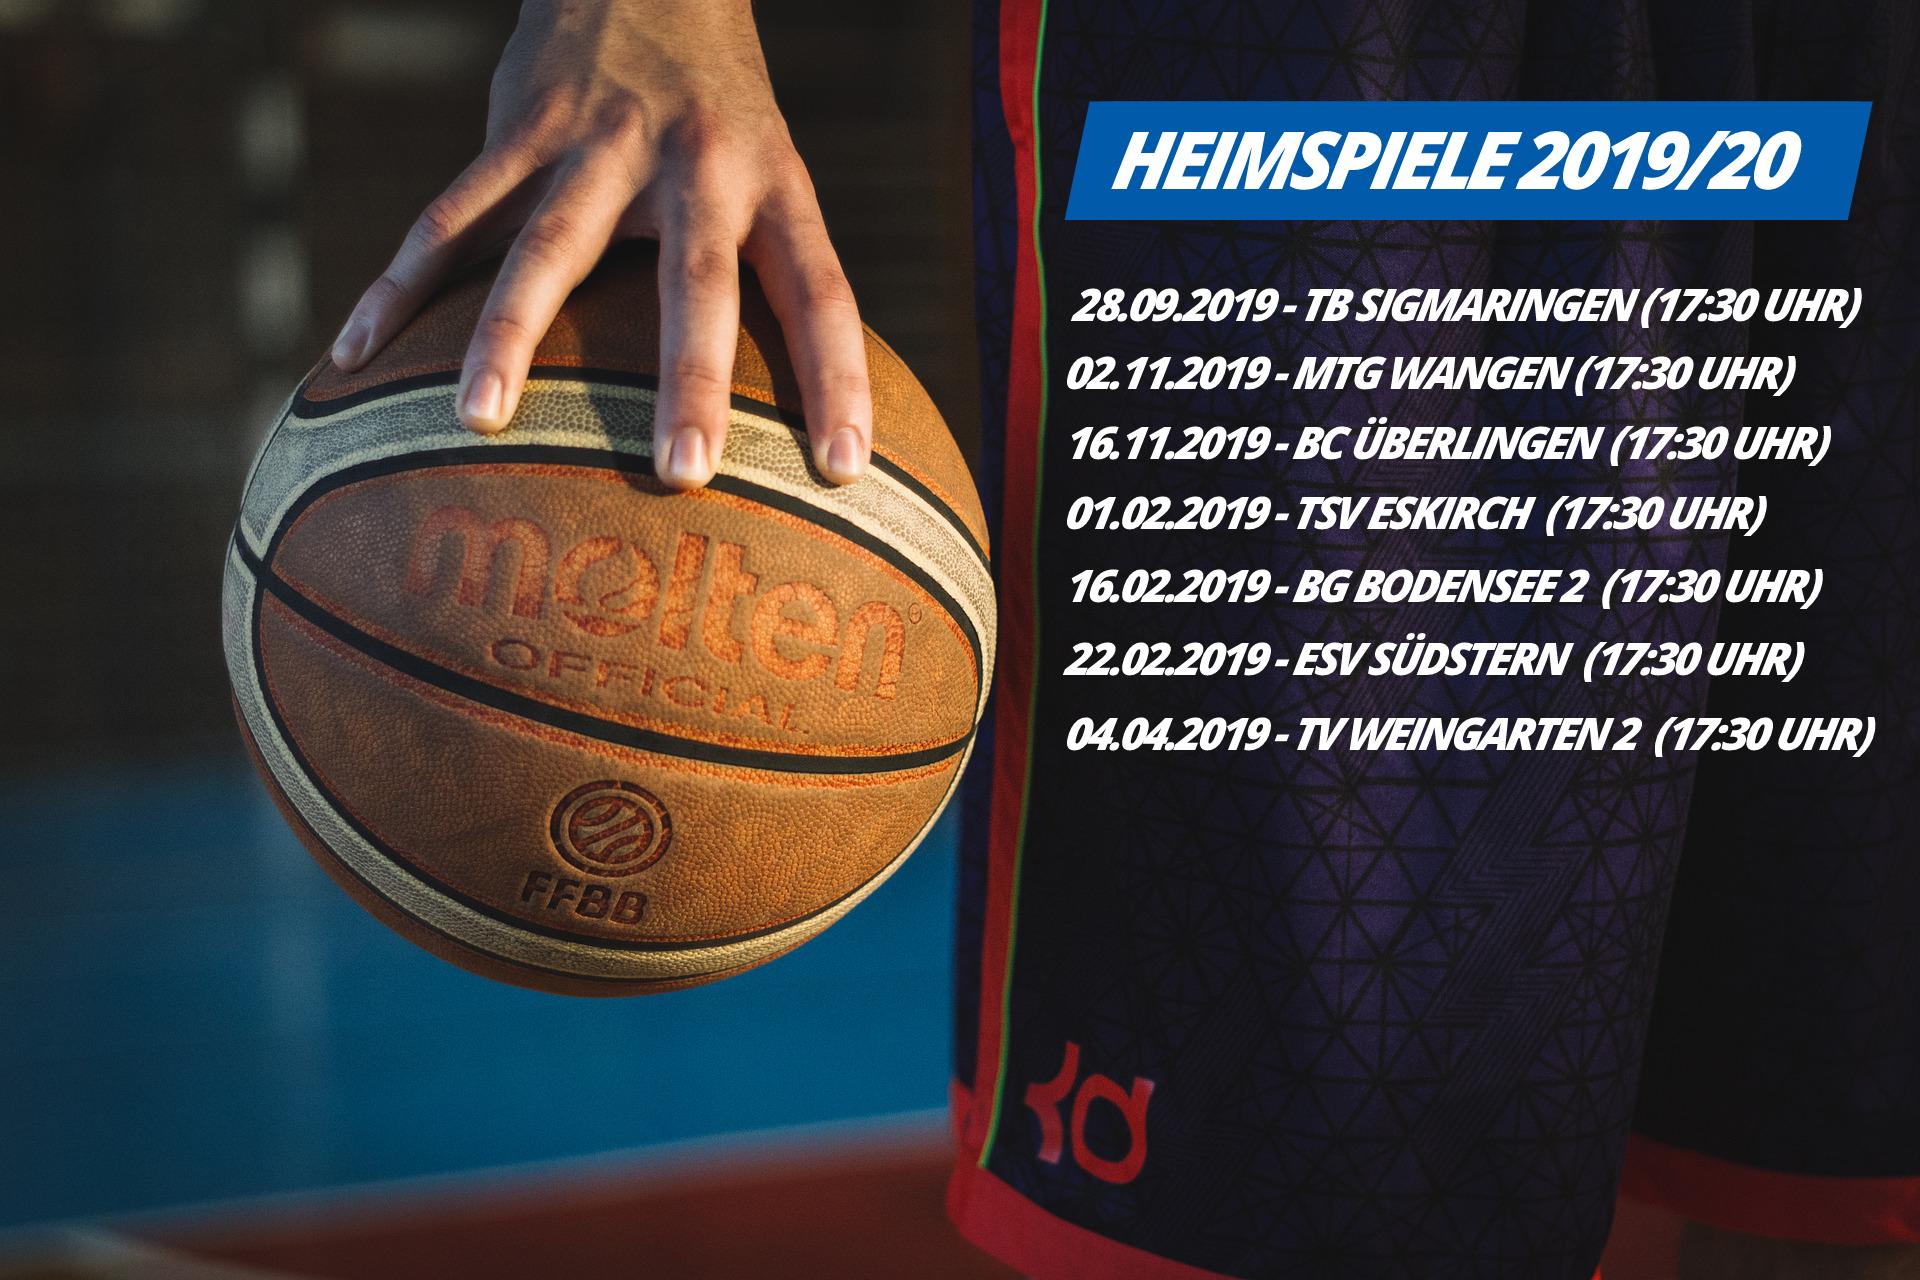 Spielplan Kreisliga A Süd (Alb/Bodensee), Saison 2019/20